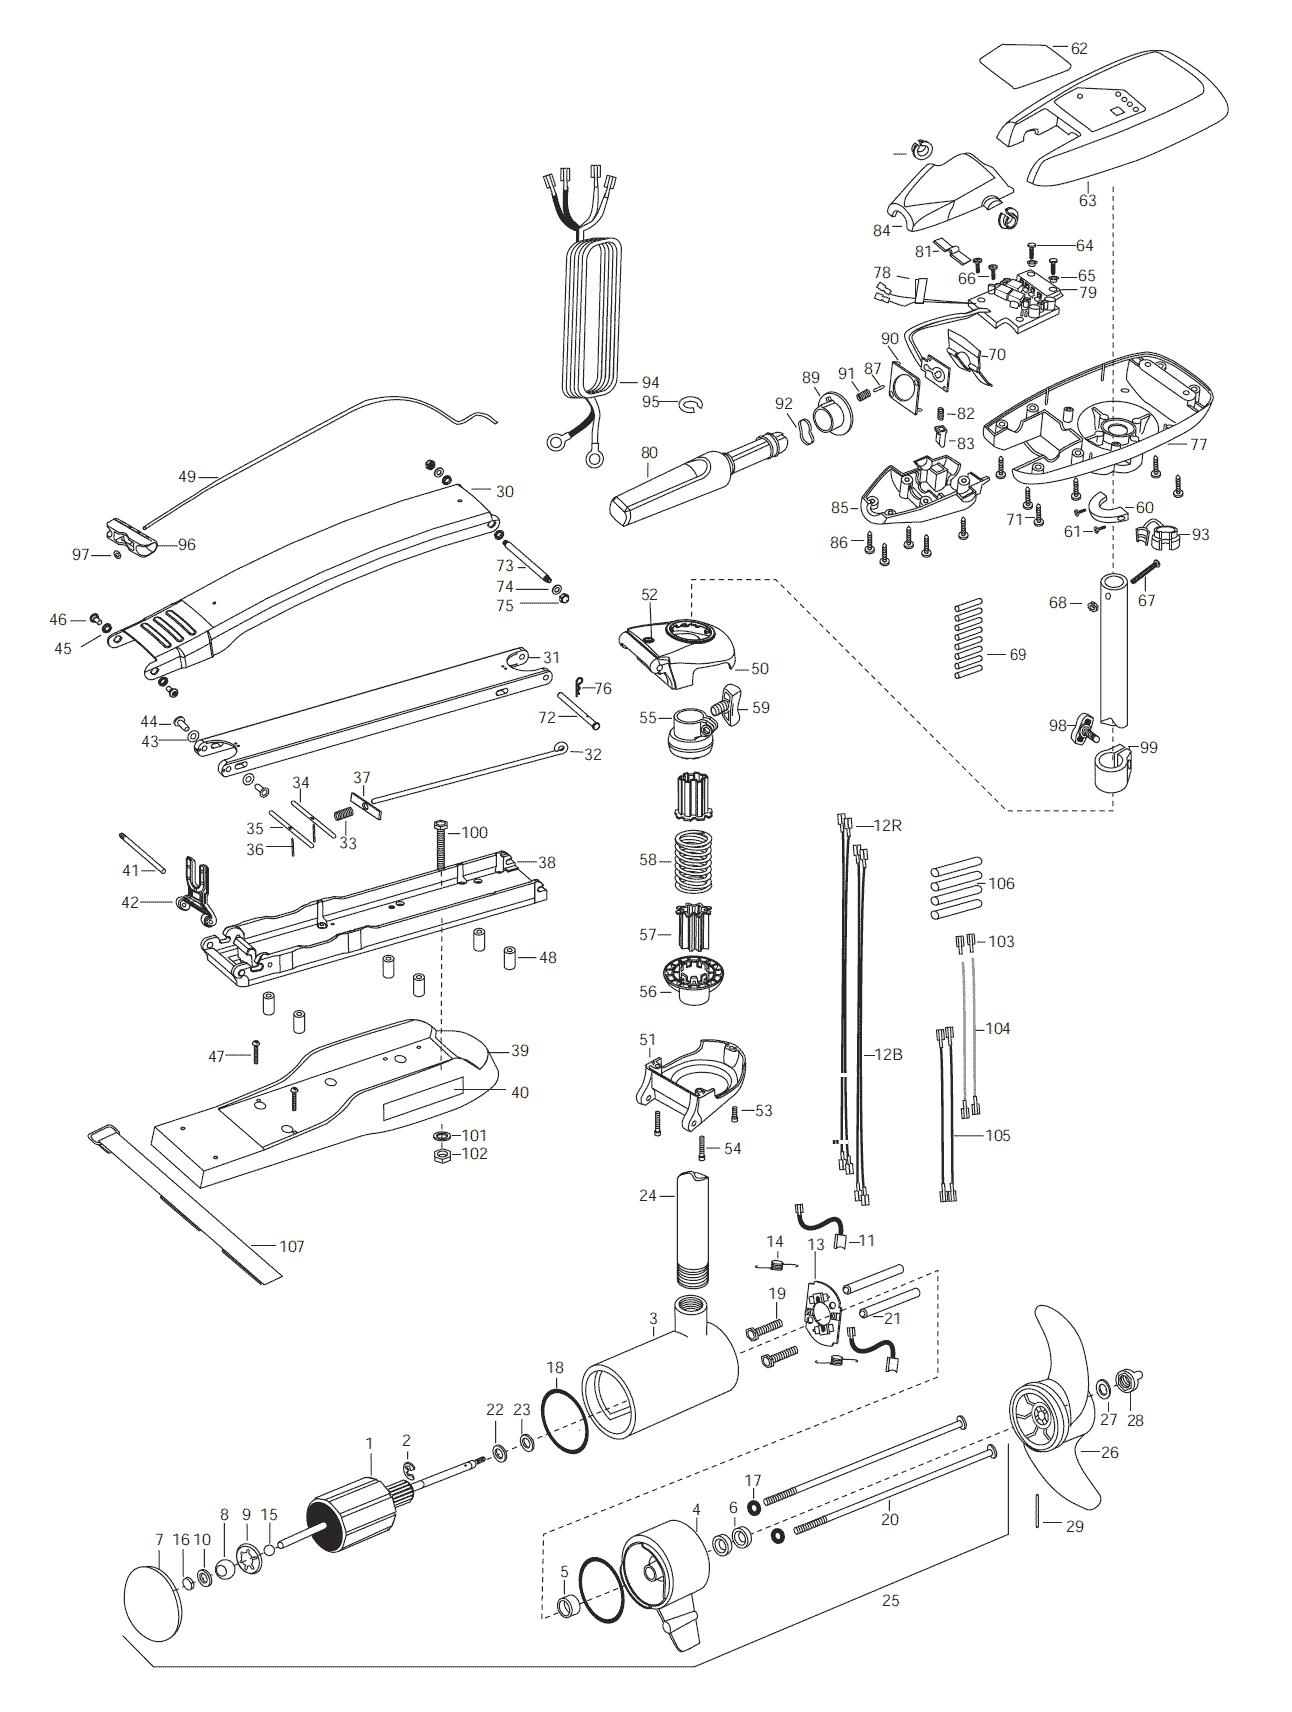 Minn Kota Riptide 74 Bowguard 52 Inch Parts